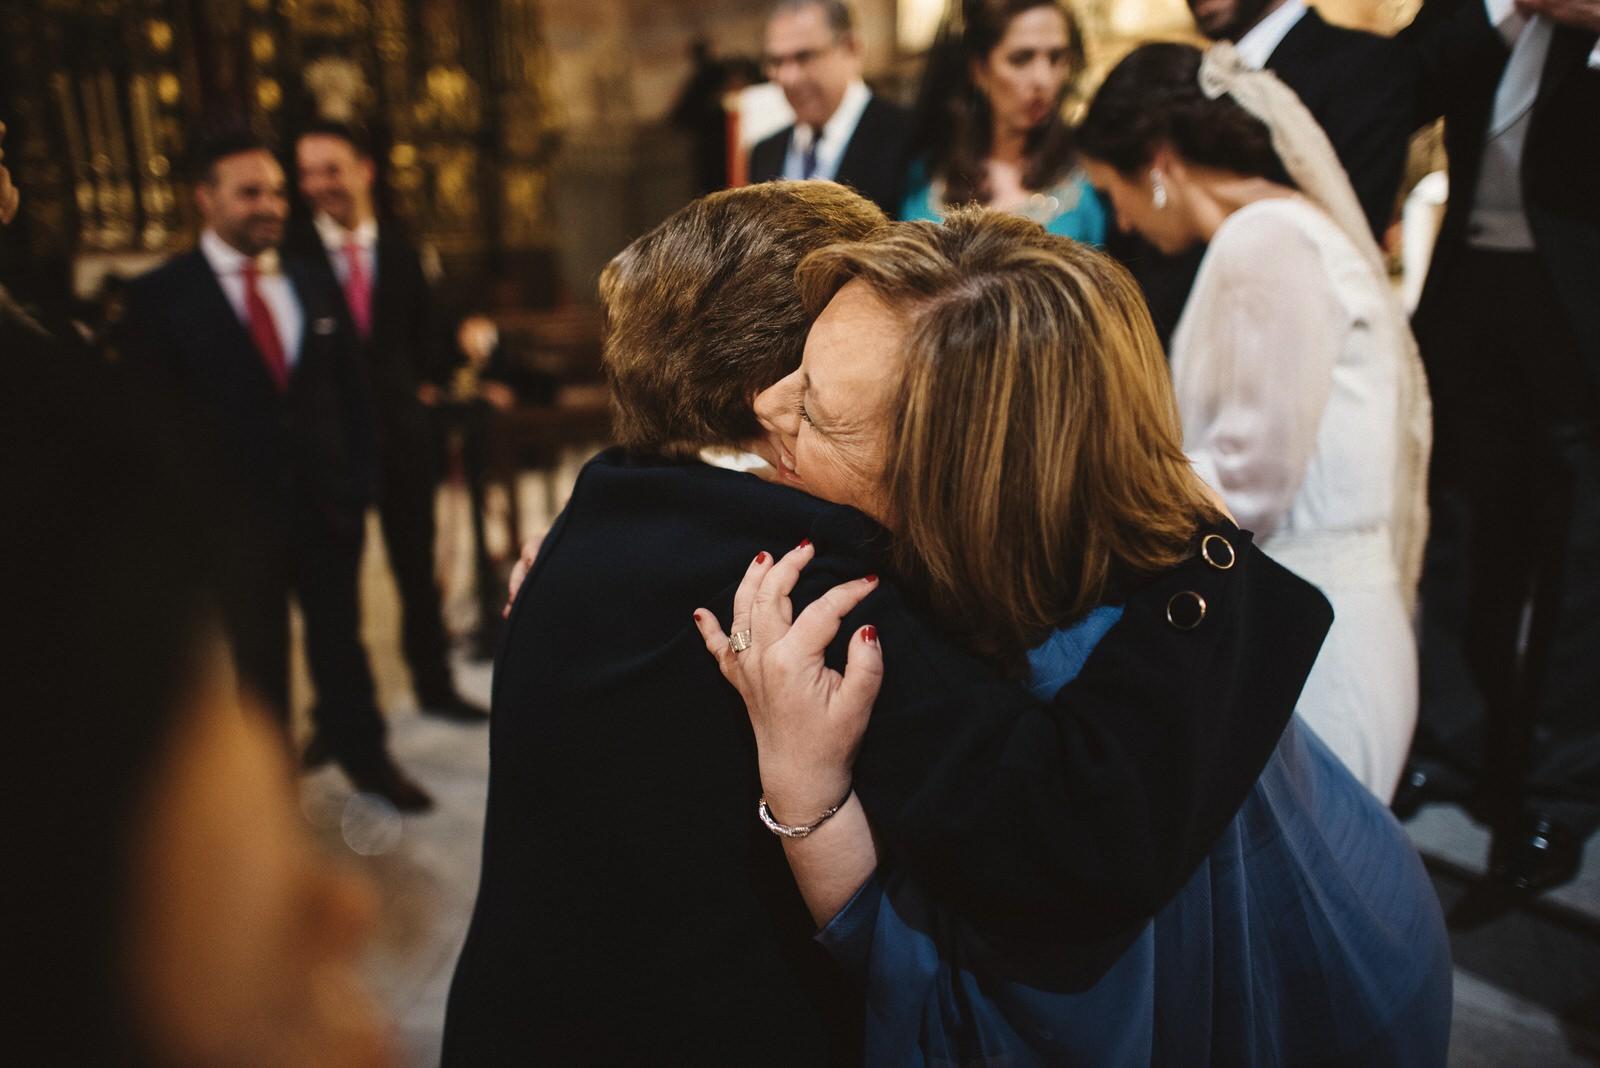 fotografo de bodas sevilla - fotografo boda - fotografía sevilla - Andrés AmarilloAAA_3147- fine.JPG